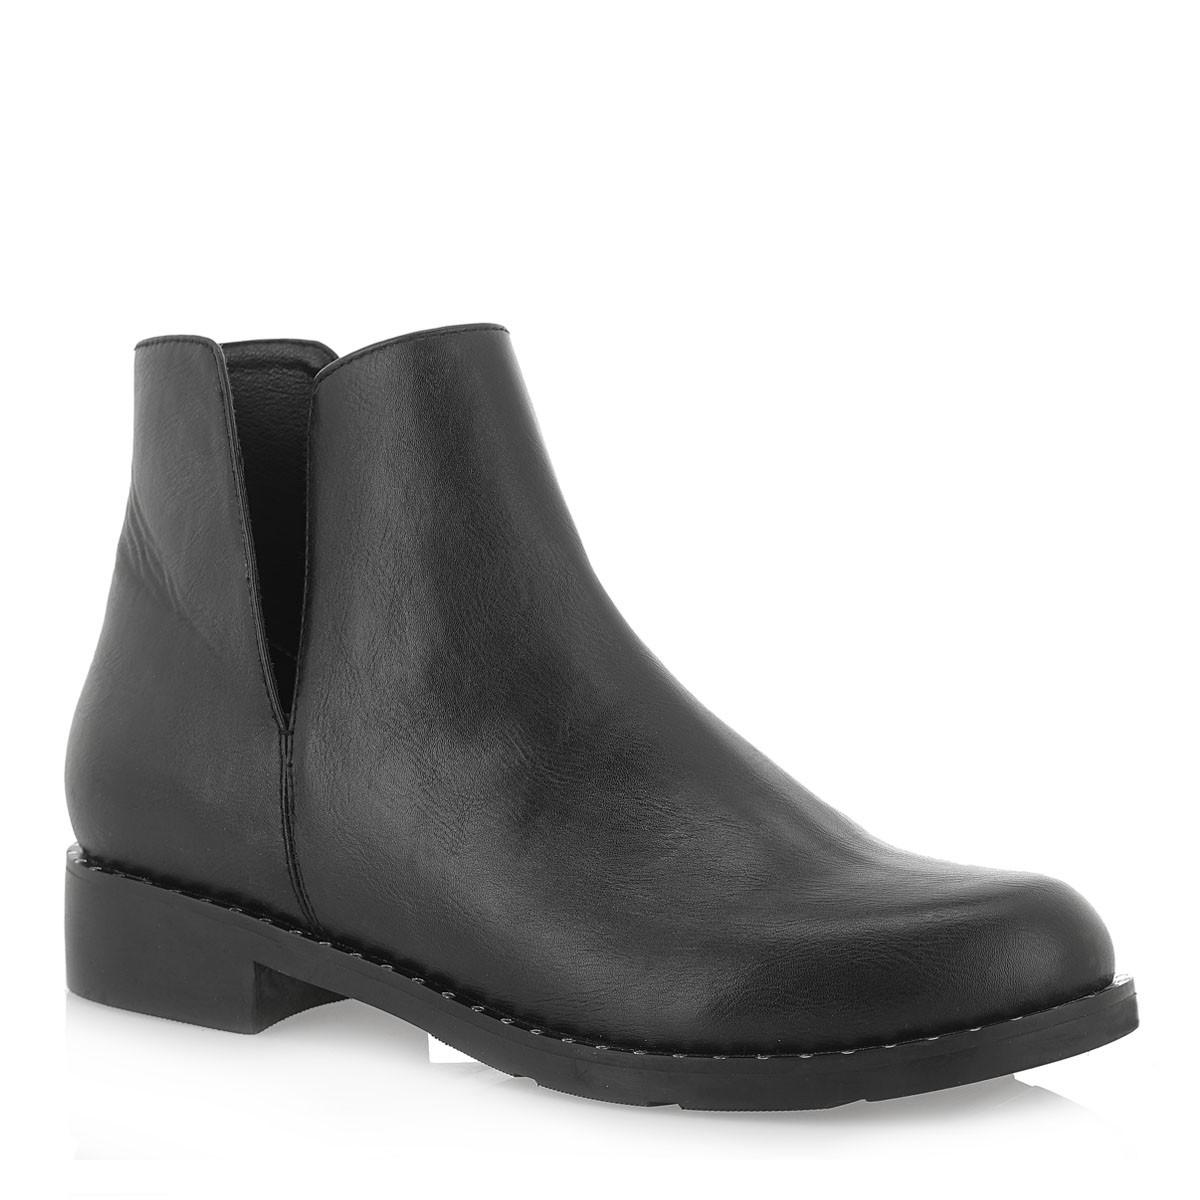 Exe Shoes Γυναικεία Μποτάκια FRIDA-348 Μαύρo J37003482001